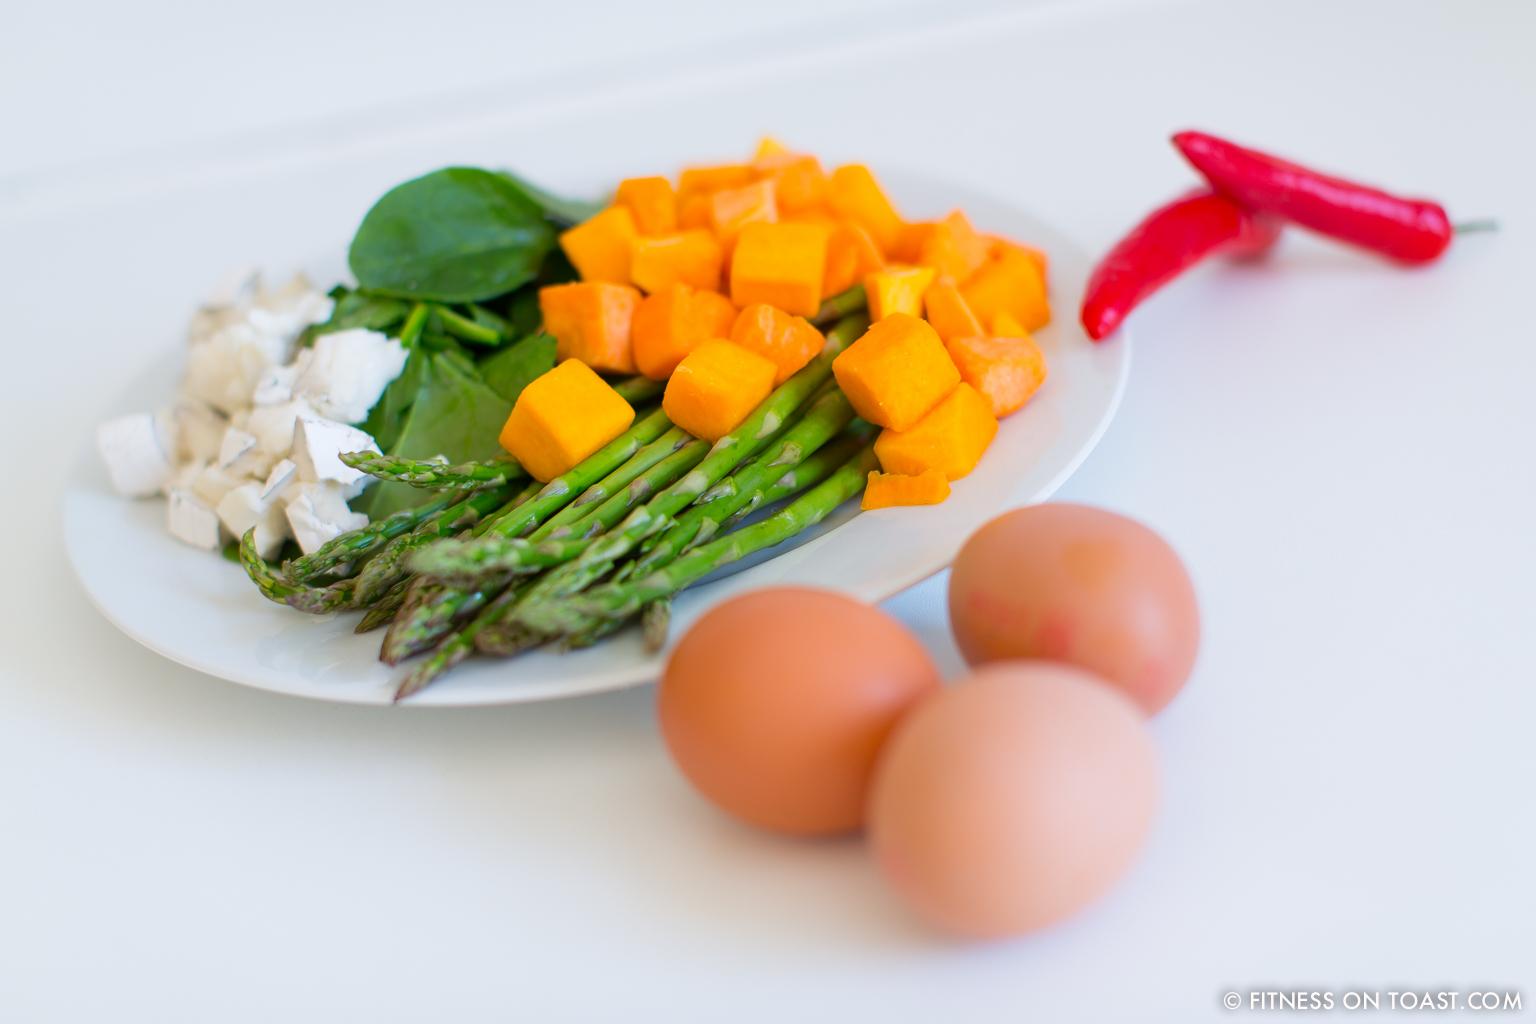 Fitness On Toast Faya Blog Post Blue Diamond Almonds Vegetable Frittata Healthy Recipe Idea Food Blog Recipes-9